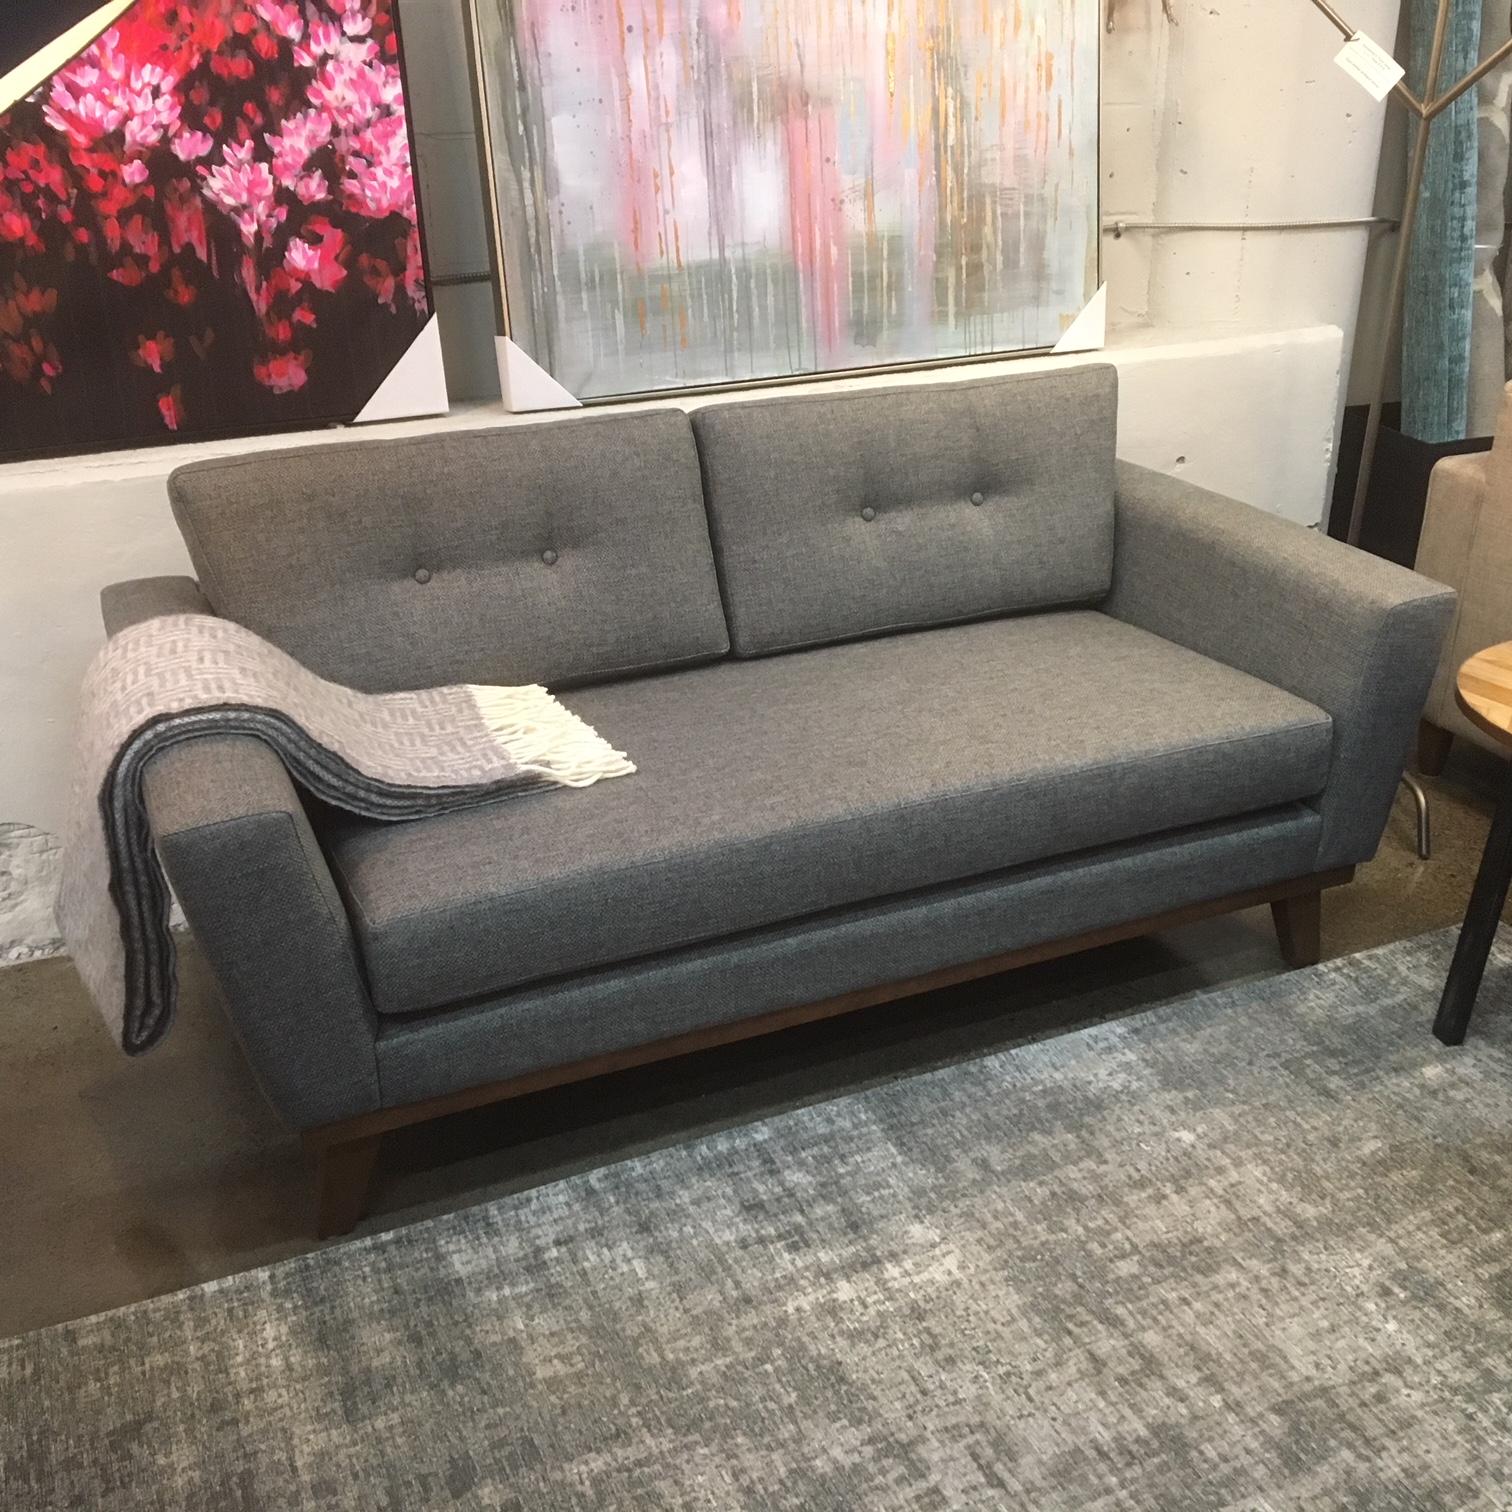 condo sized sectional sofa ottawa rv under table lida mikaza meubles modernes montreal modern furniture